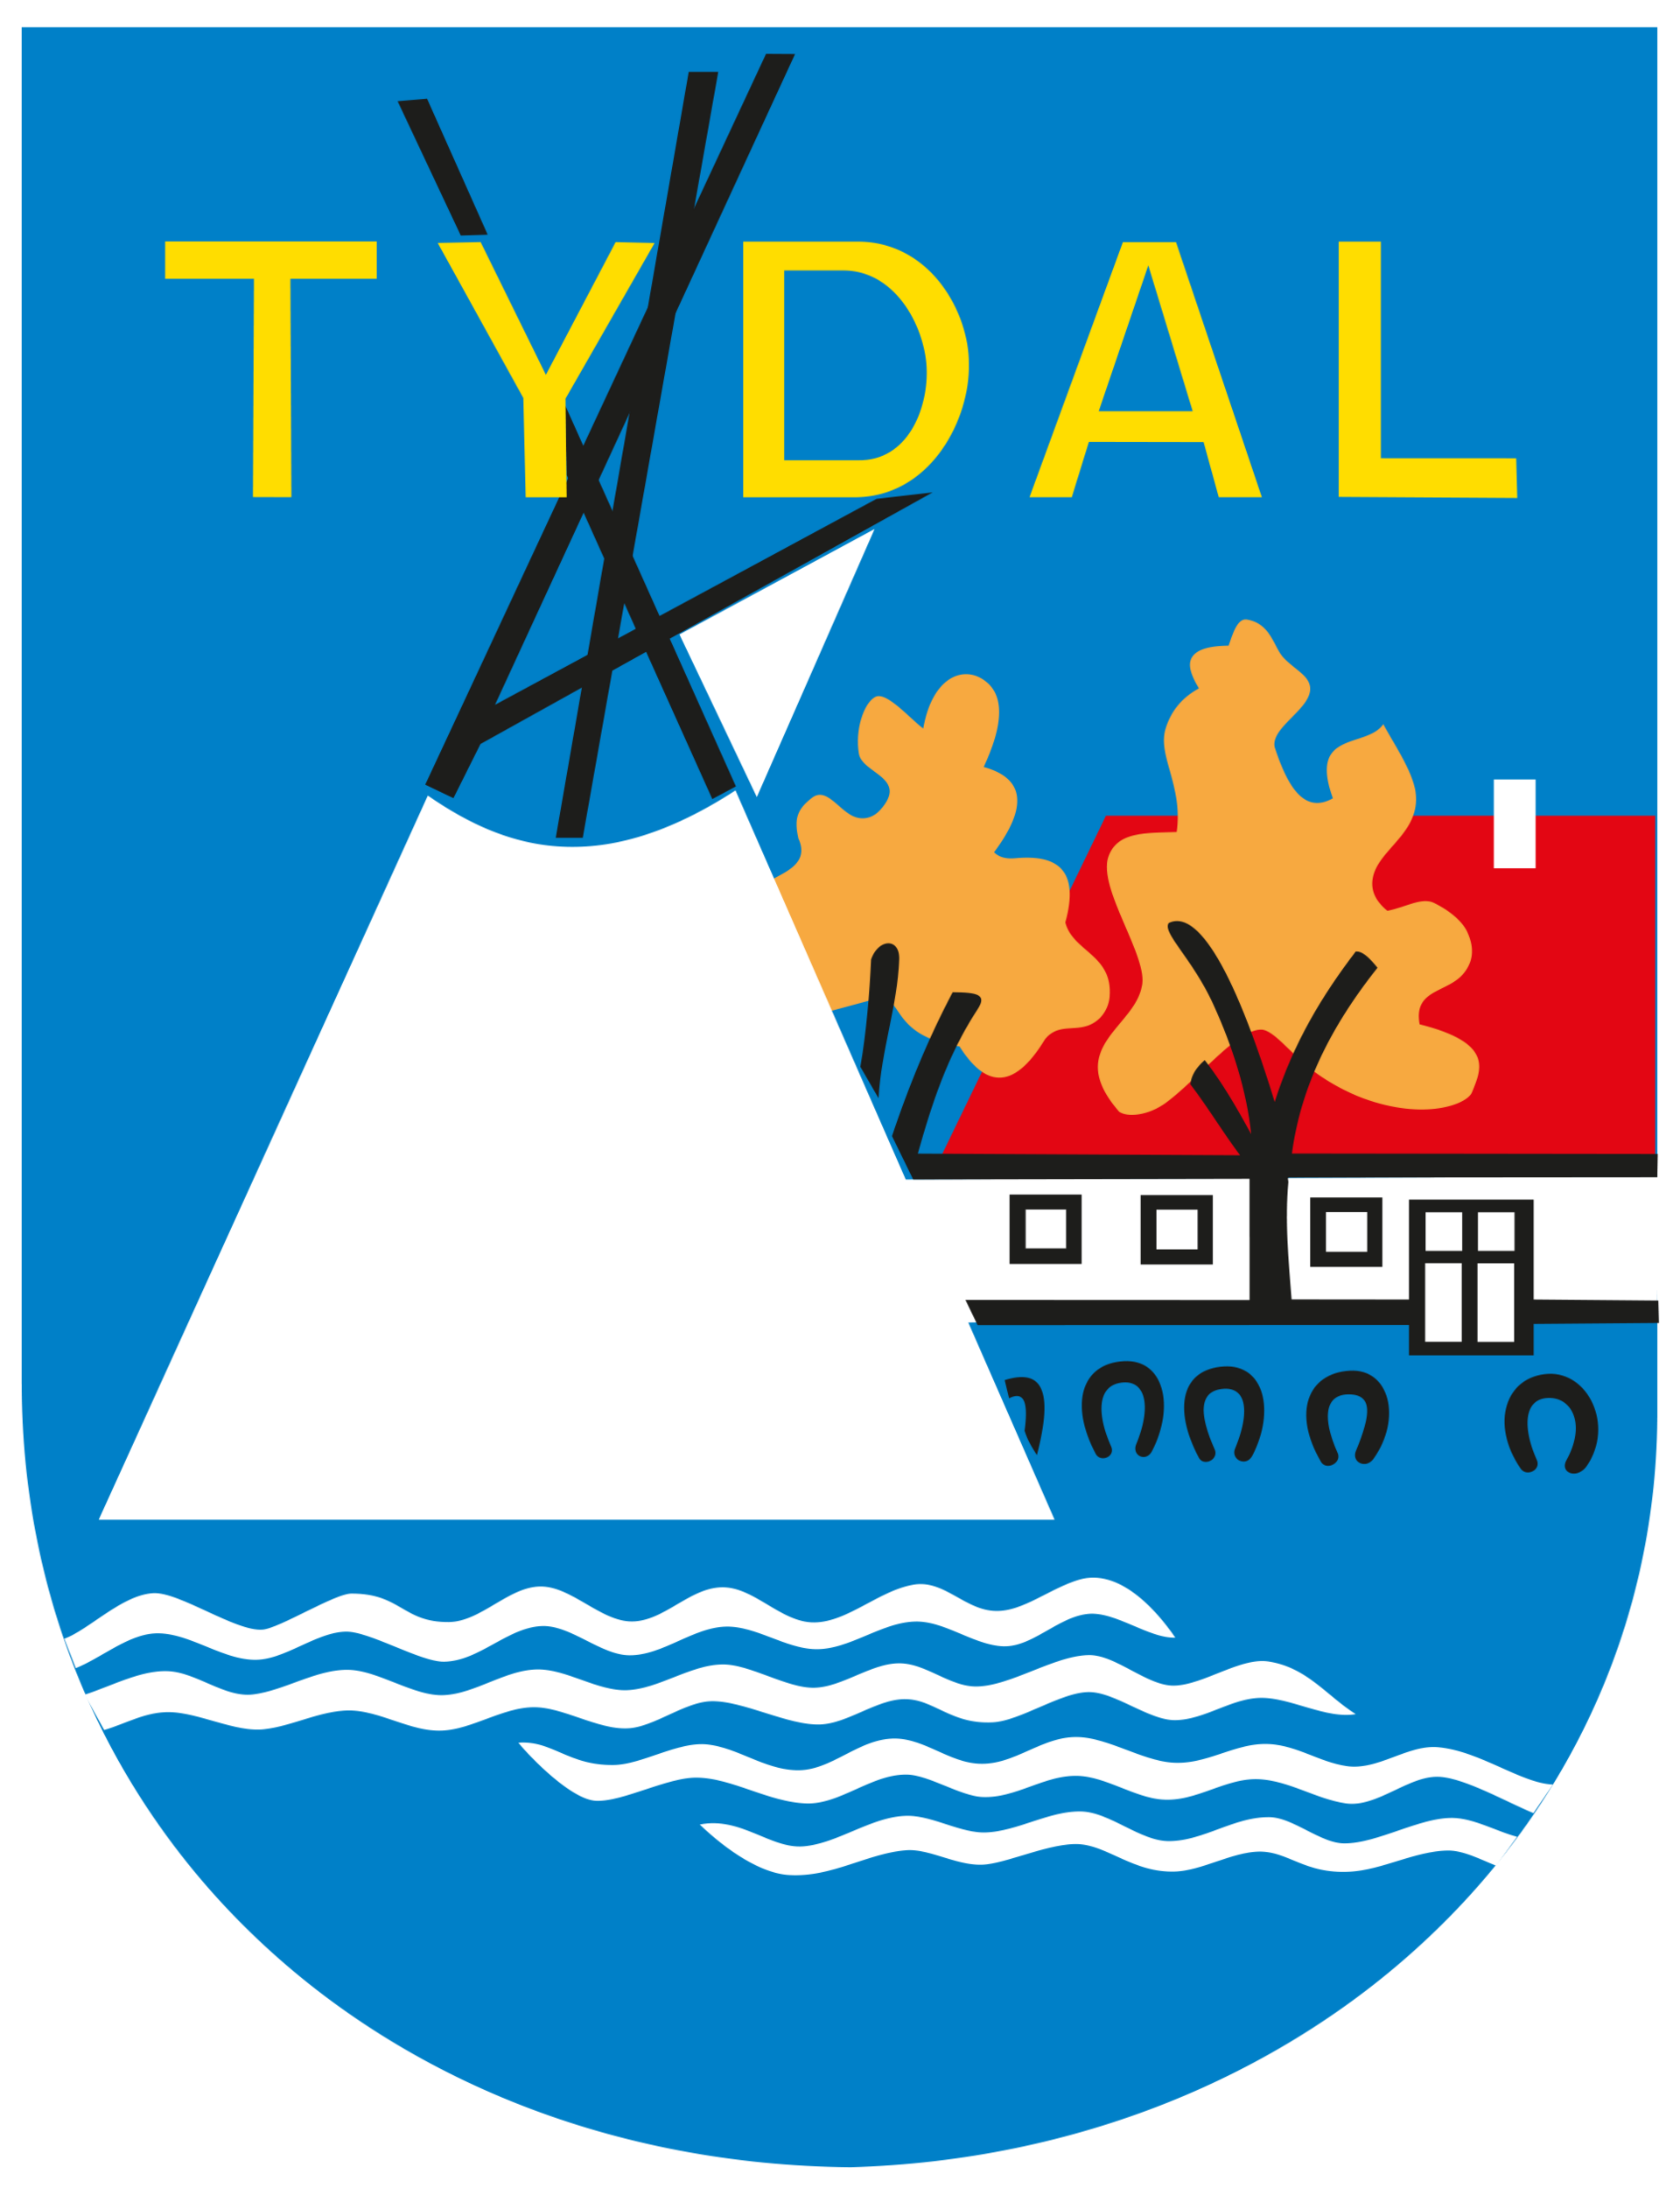 Tydal